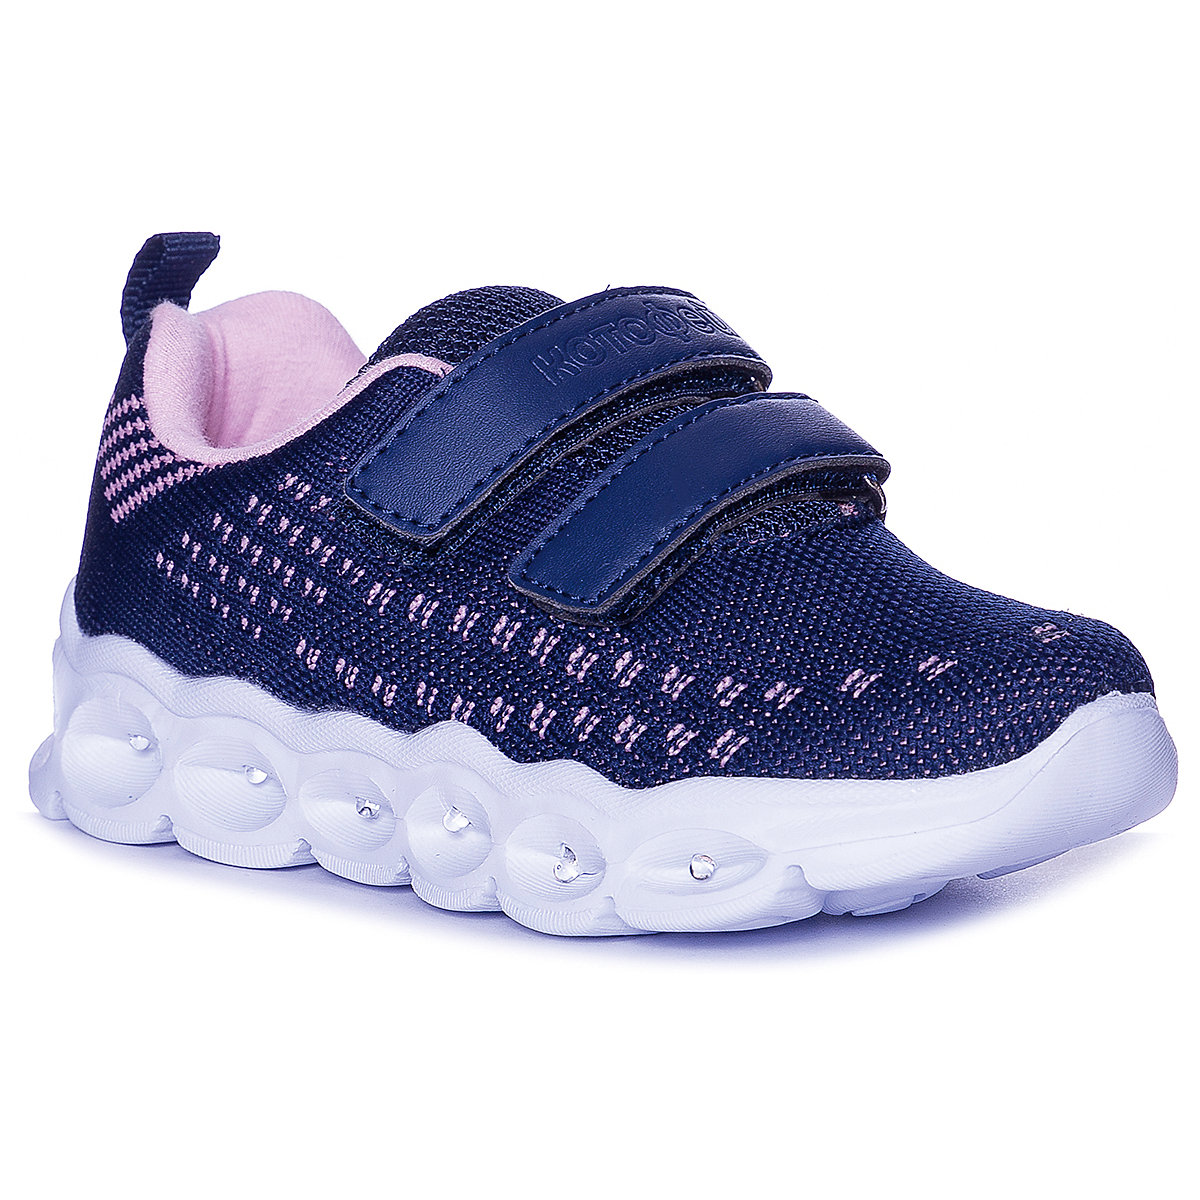 KOTOFEY Kids' Sneakers 10944098 Children's Sports Running Shoes Spring Autumn Blue